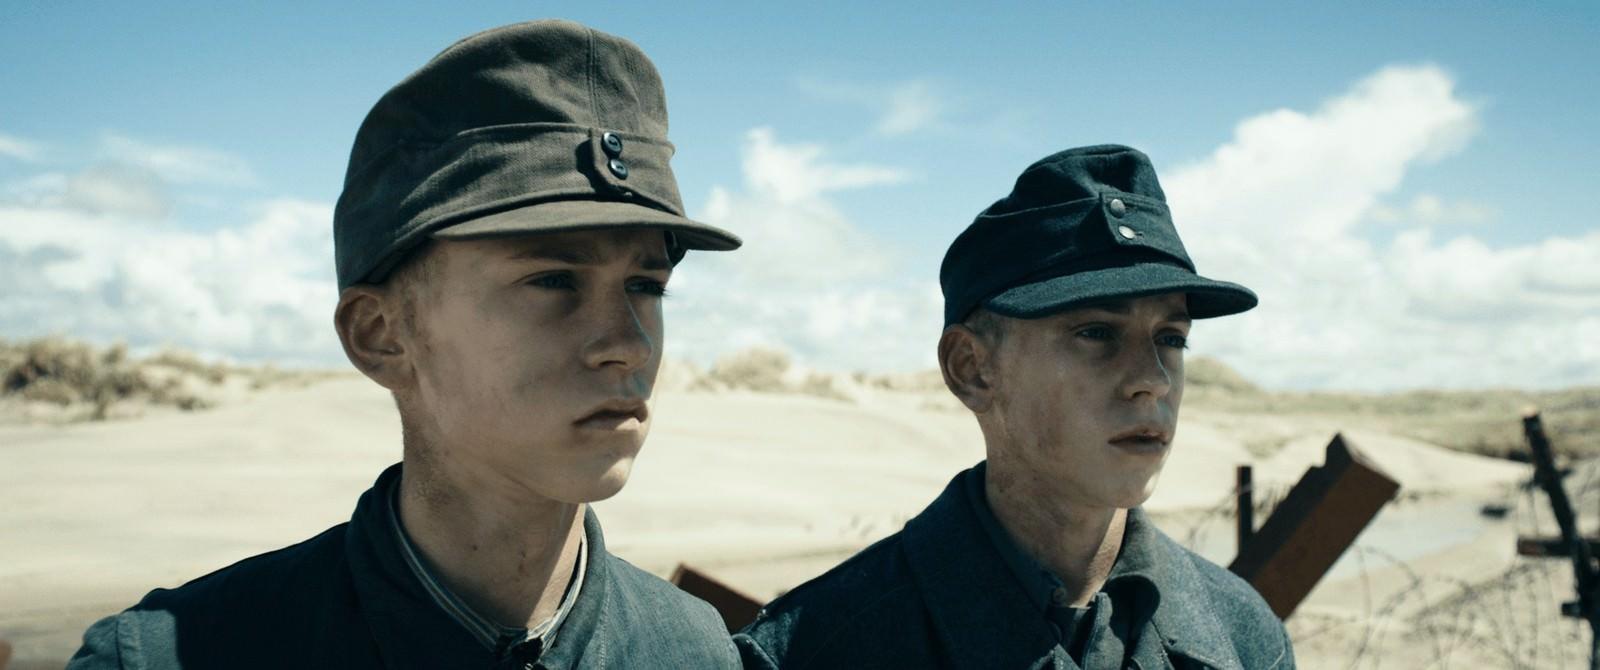 Movie, Under sandet(丹麥, 2016年) / 拆彈少年(台灣) / 十個拆彈的少年(香港) / Land of Mine(英文) / 地雷区(網路), 電影劇照, 角色與演員介紹